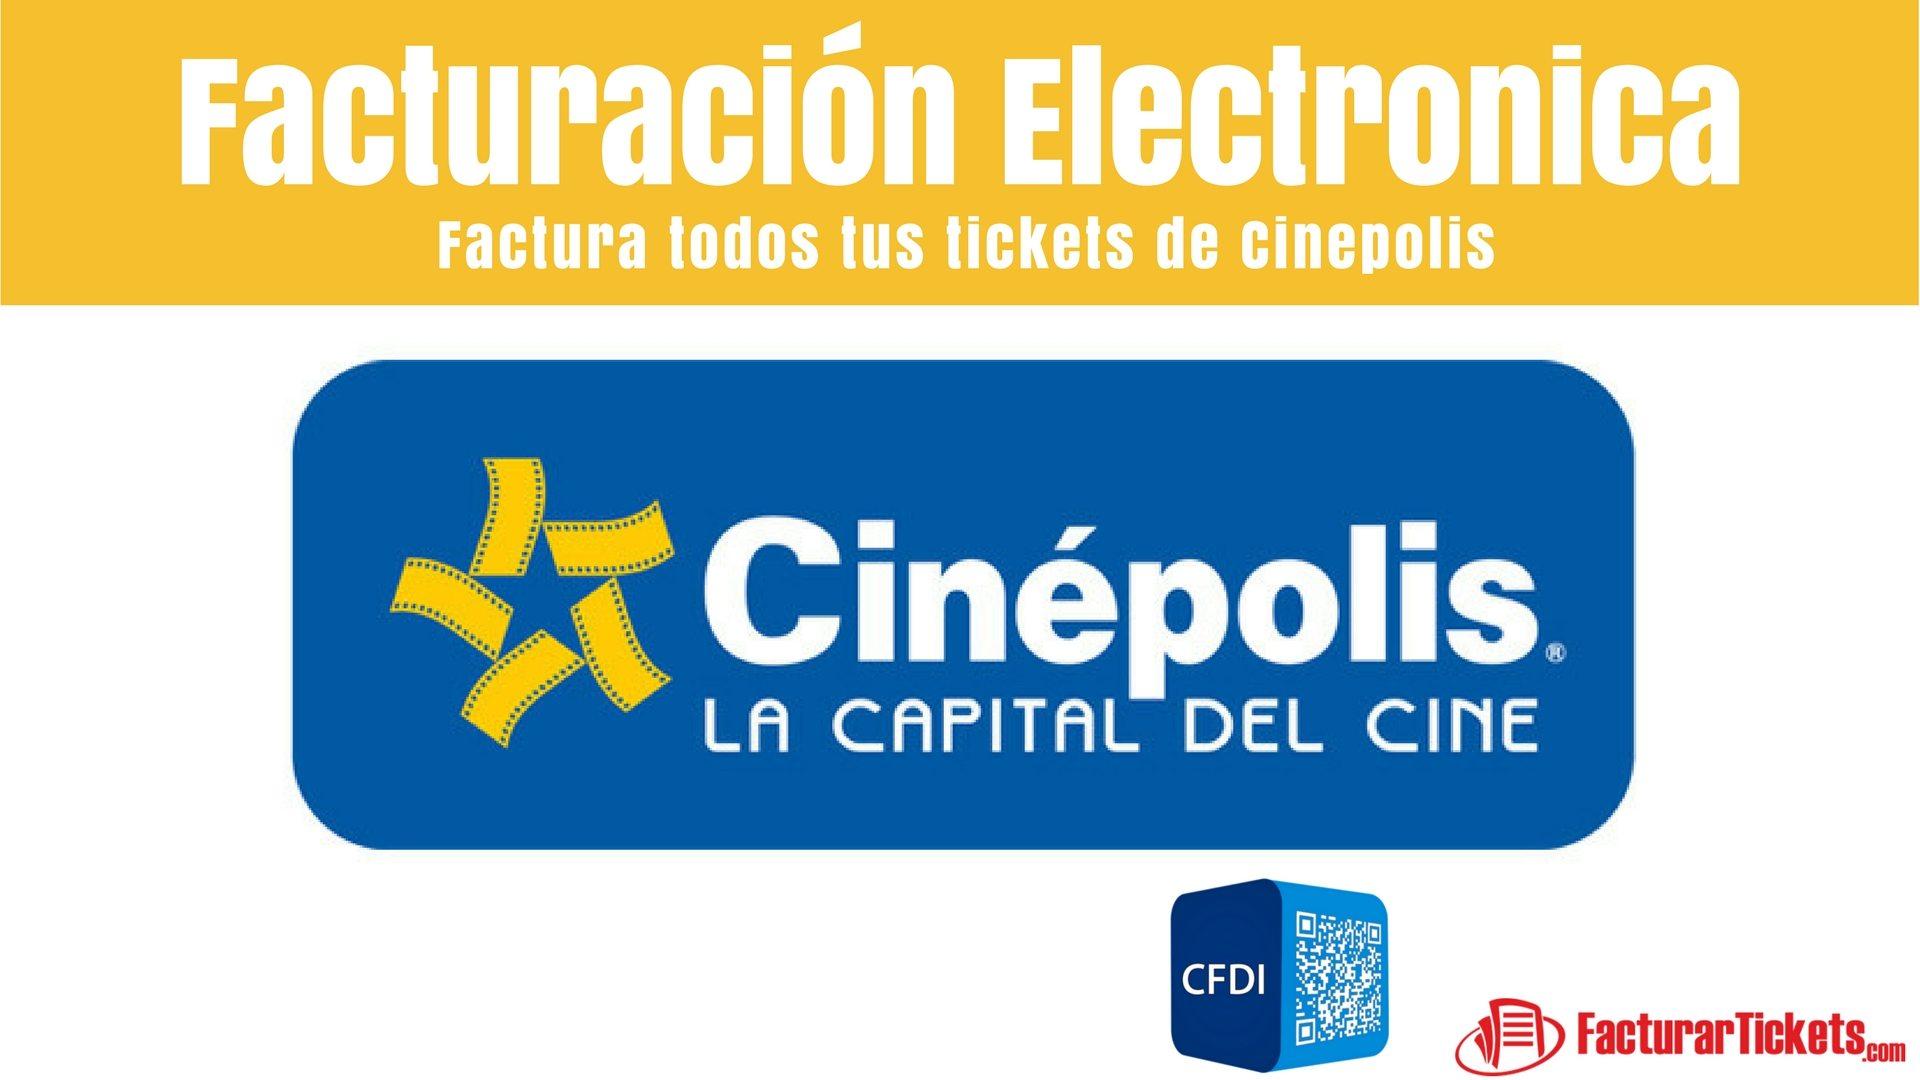 Cinepolis facturacion en linea